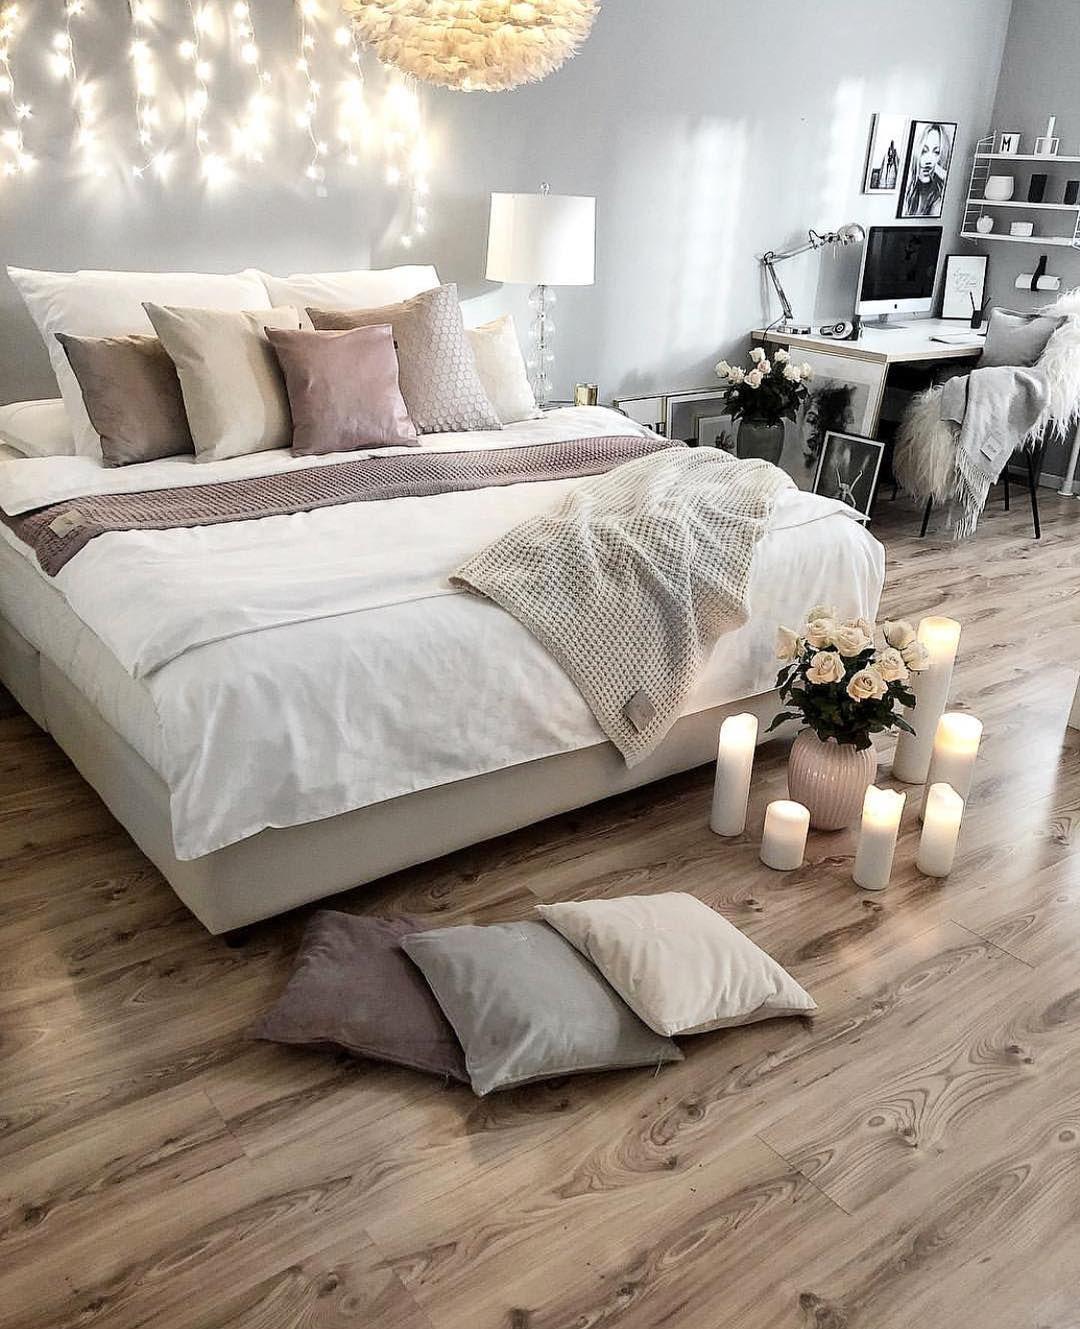 ️ Dreamy bedrooms on Instagram • photo © easyinterieur